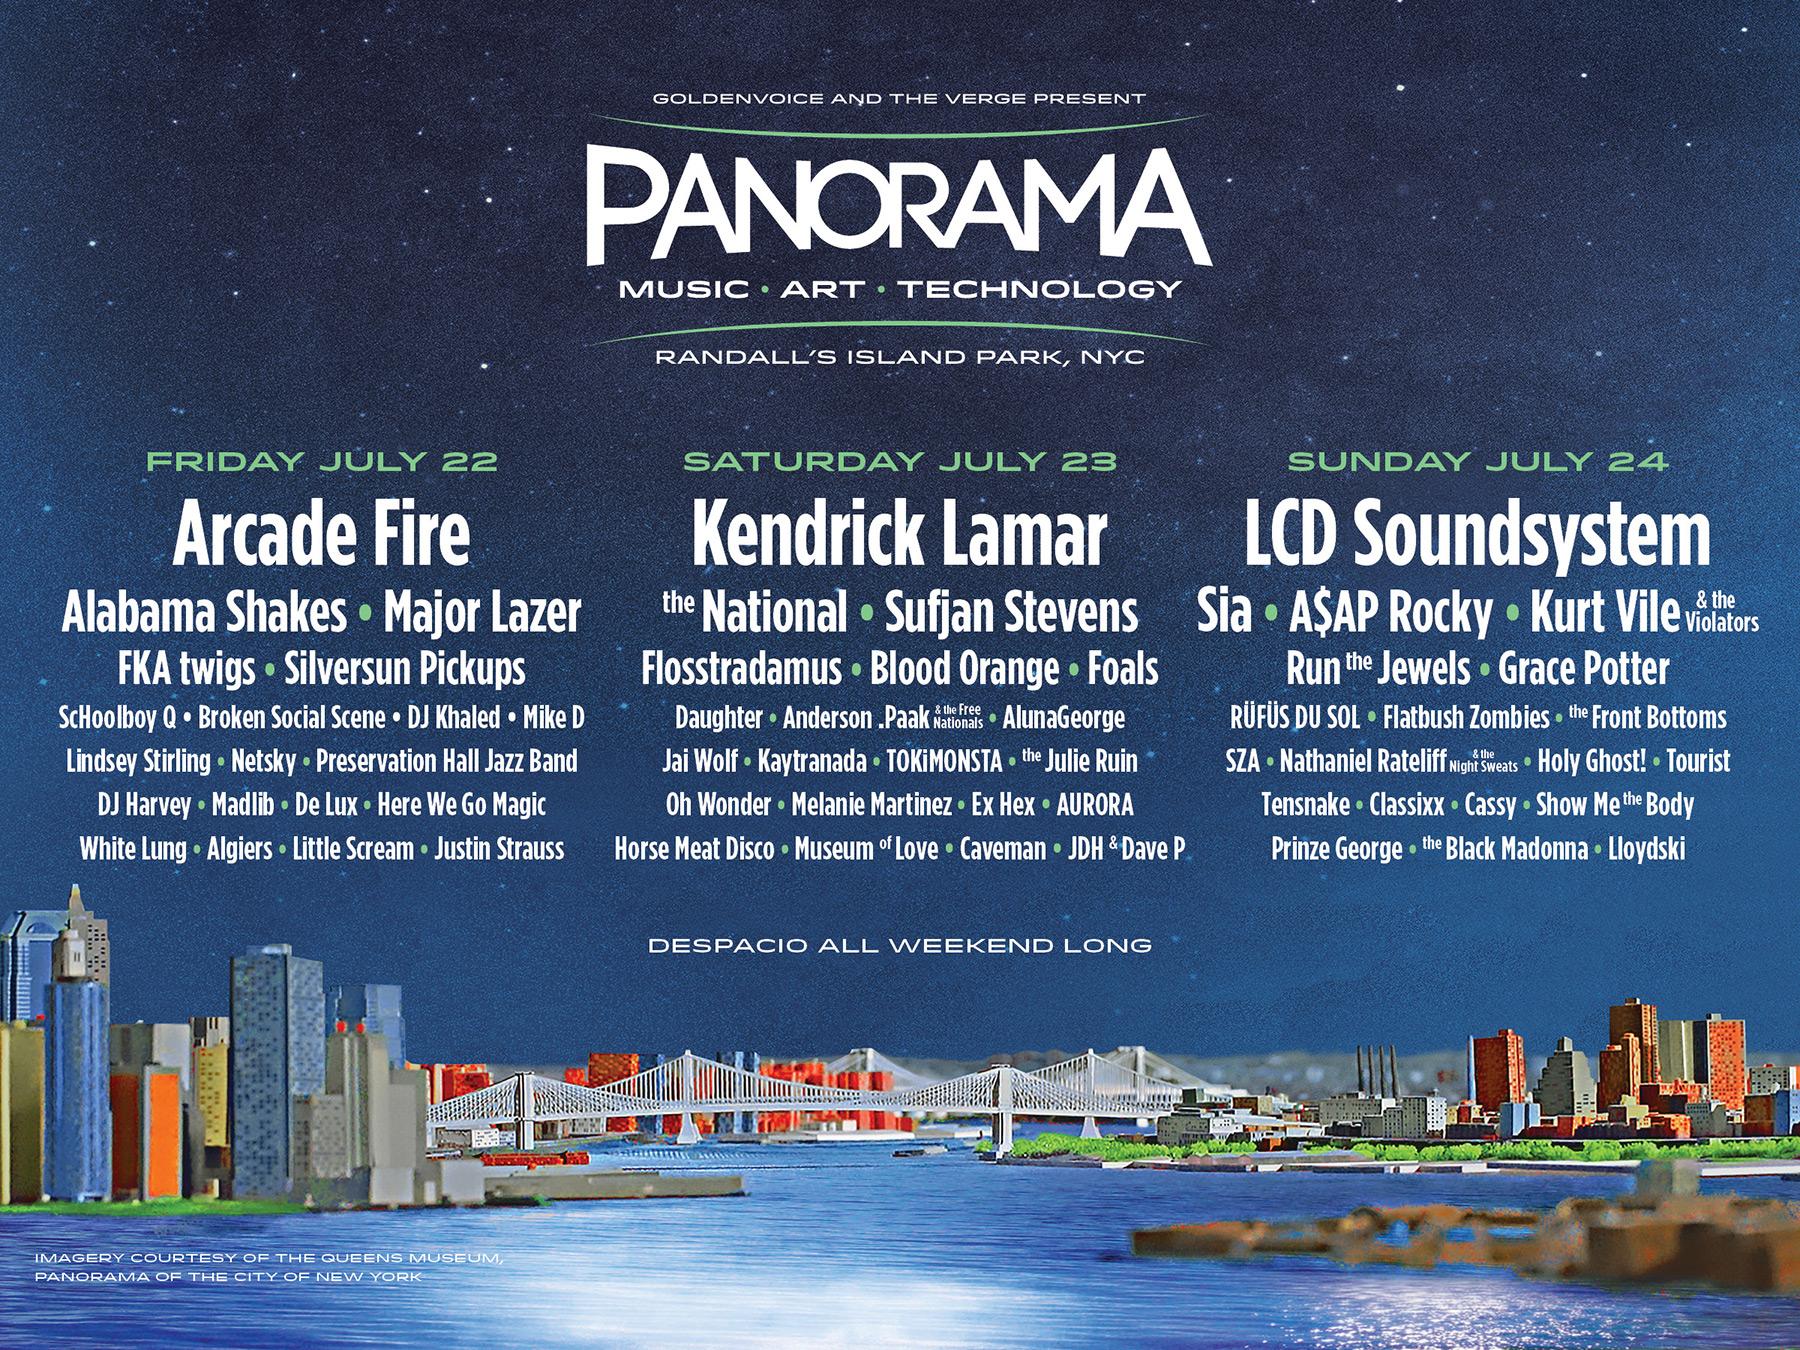 panorama16 web1800x1350 v16 Panorama reveals inaugural lineup: Arcade Fire, LCD Soundsystem, Kendrick Lamar